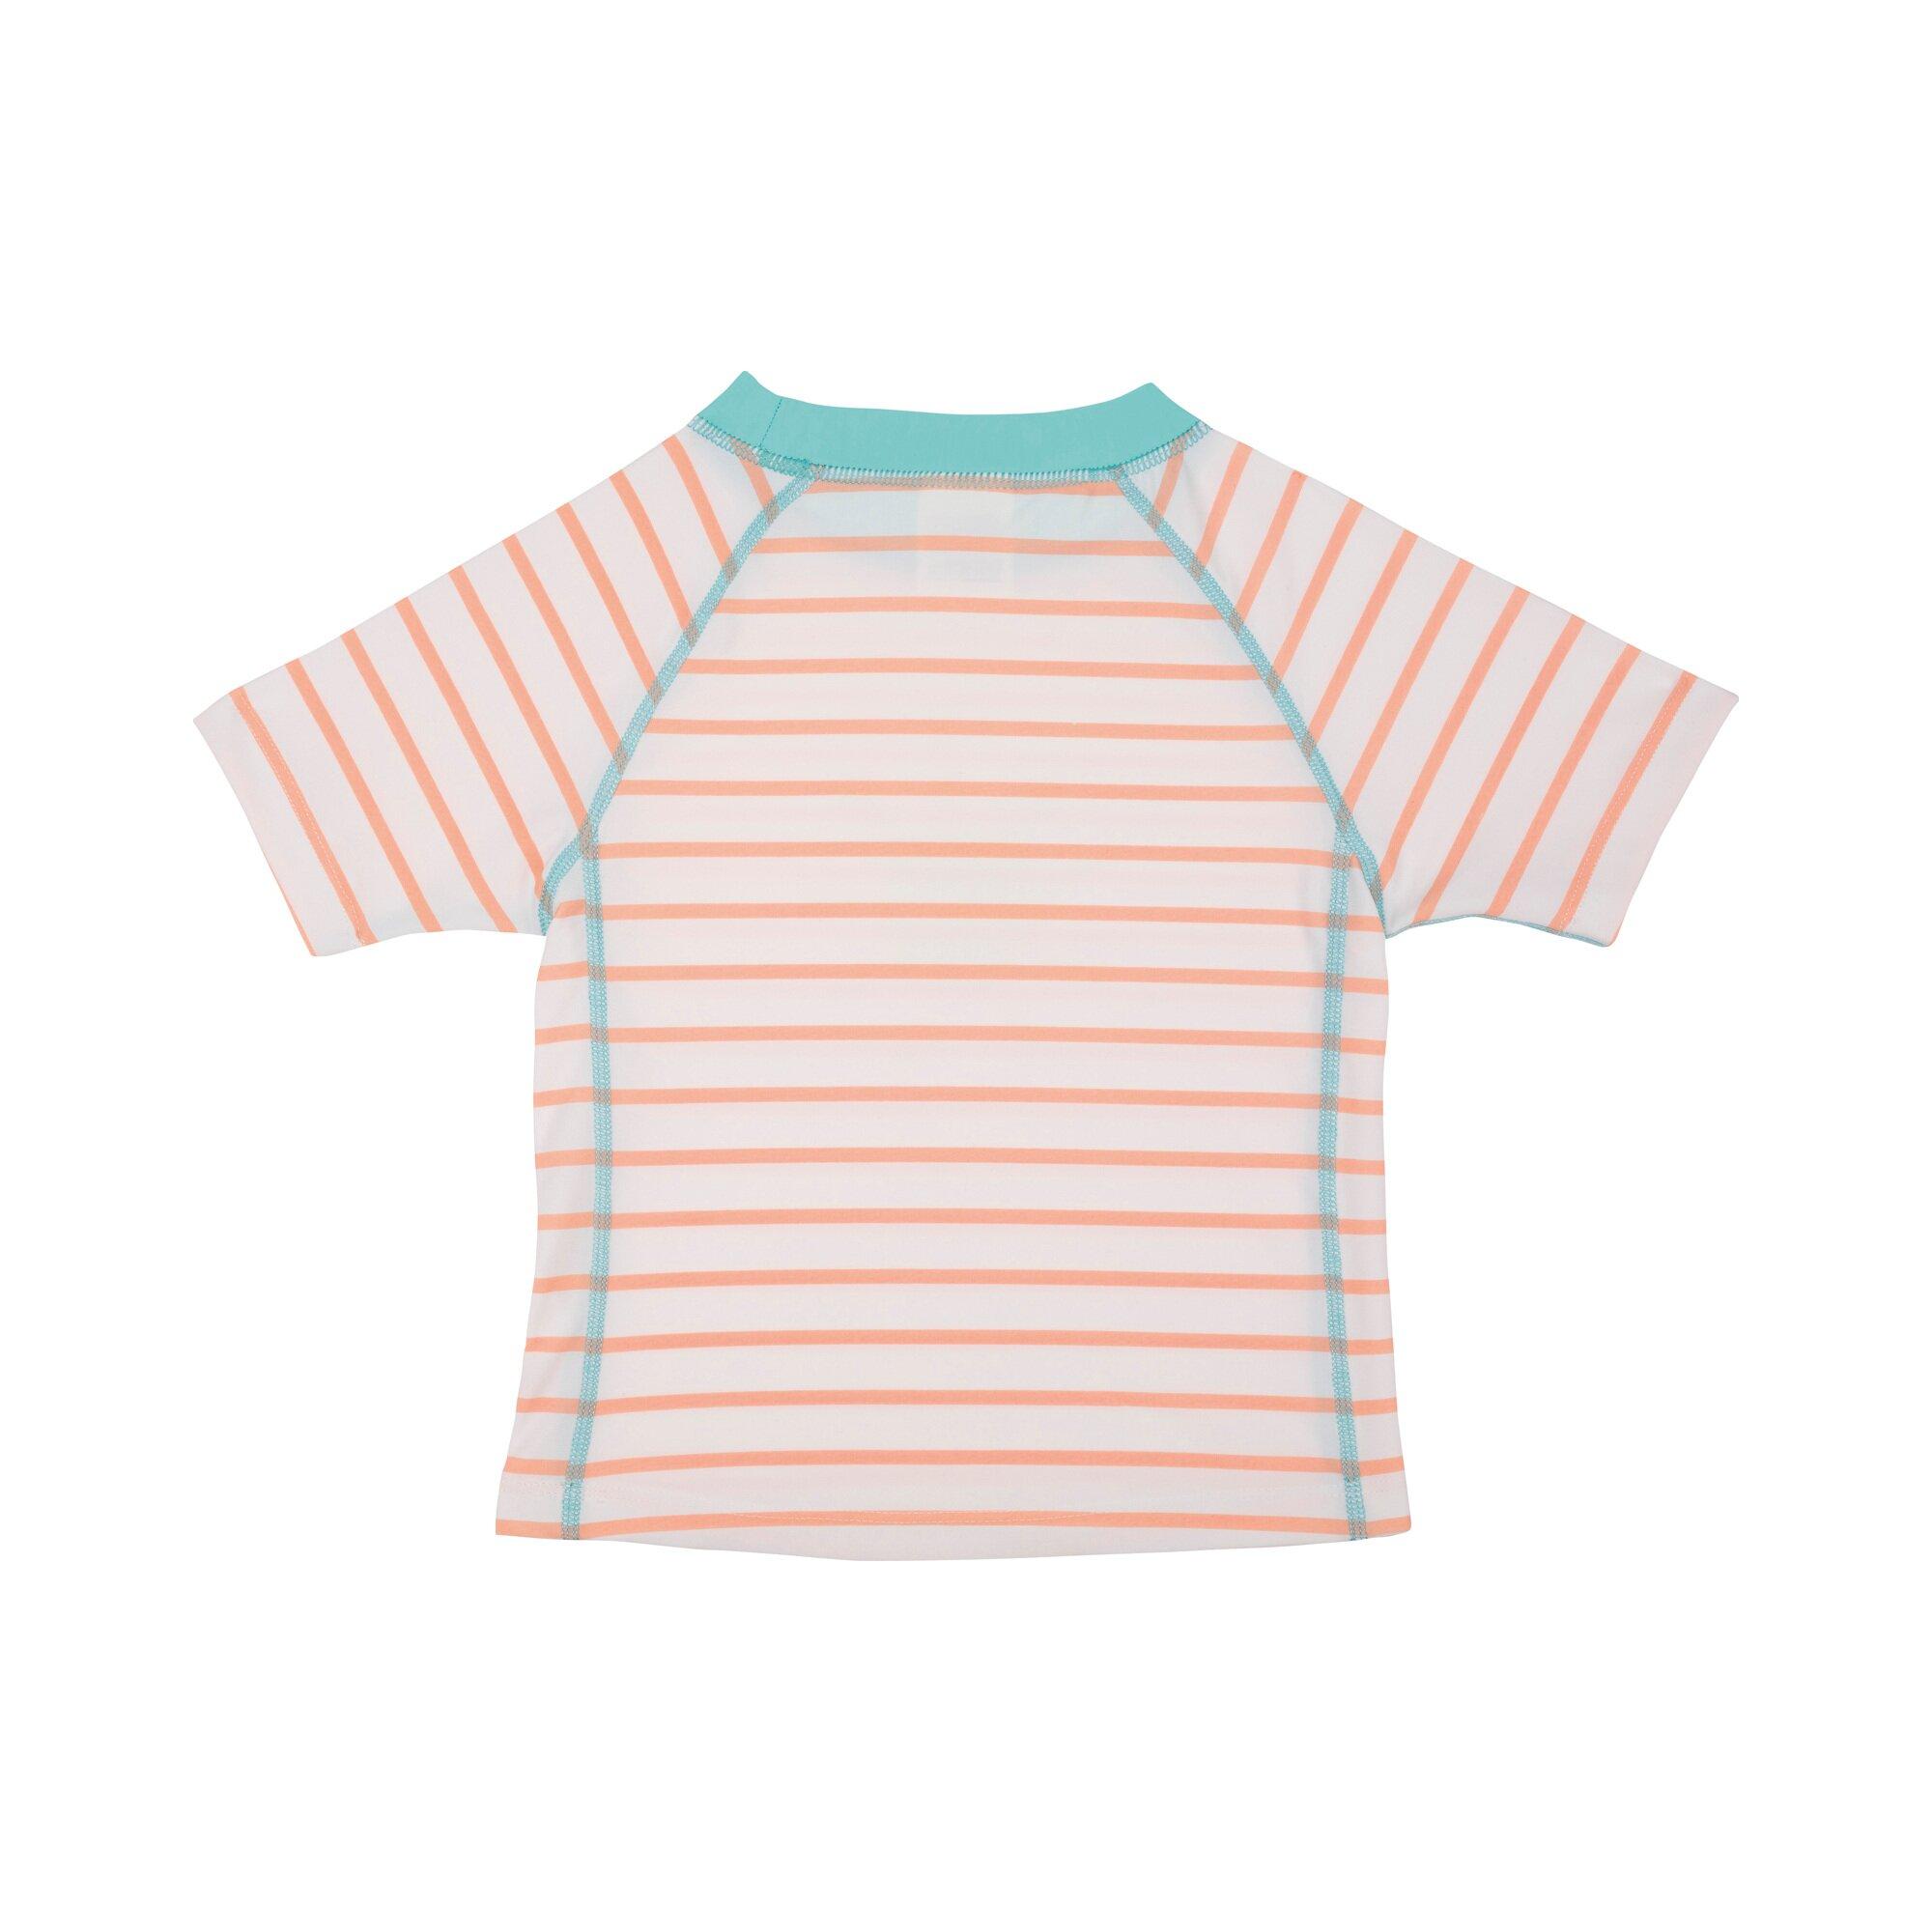 lassig-t-shirt-kurzarm-stripe-mit-uv-schutz, 12.99 EUR @ babywalz-de